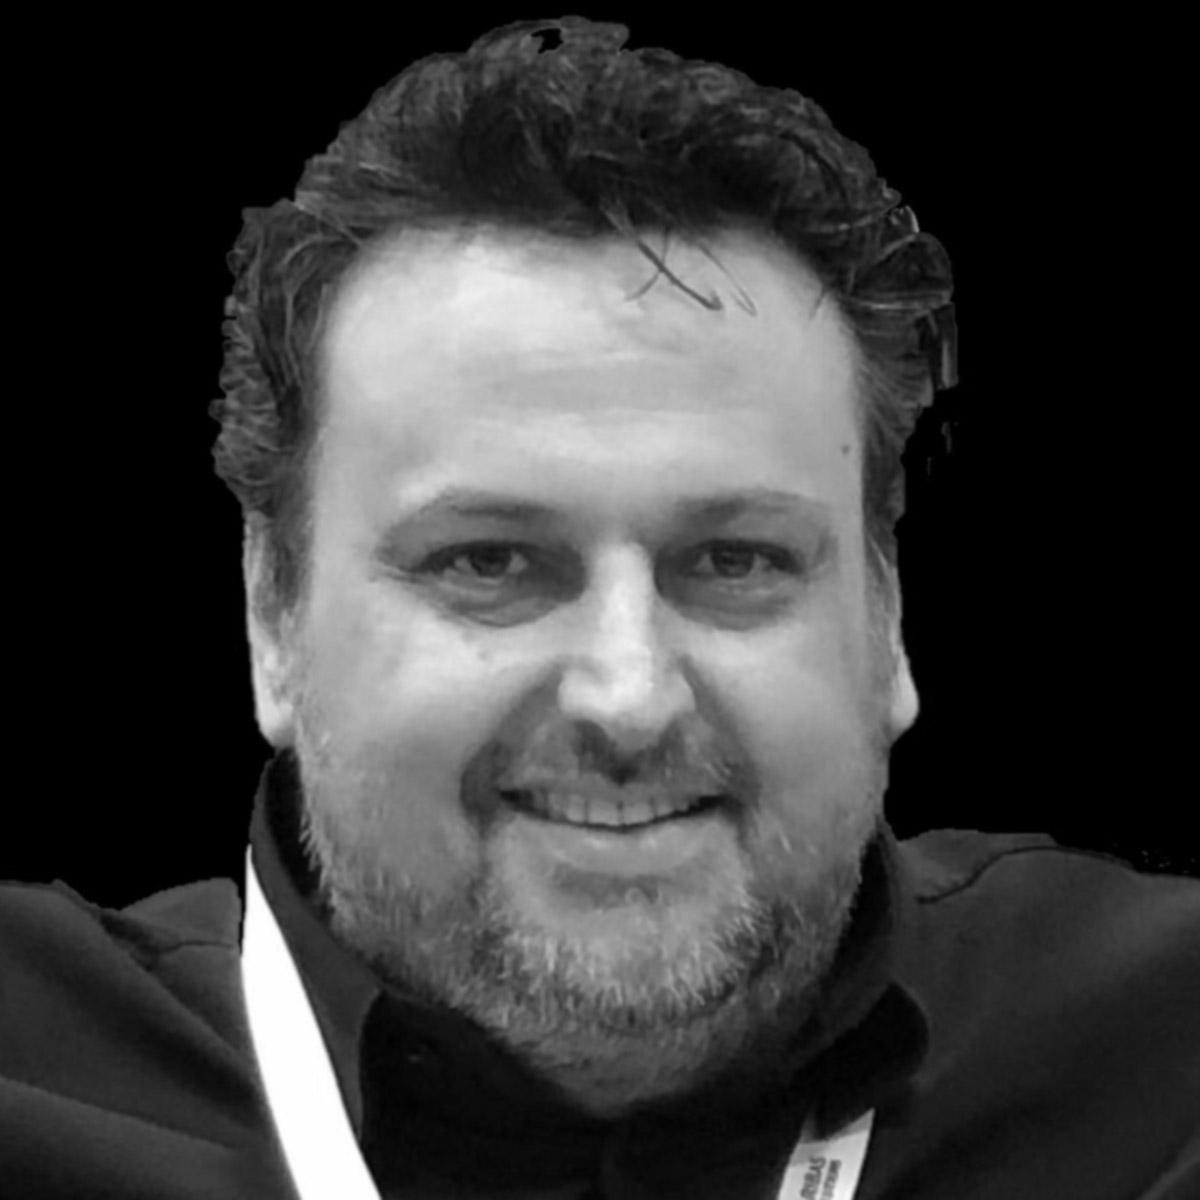 https://i0.wp.com/www.andiabruzzo.it/wp-content/uploads/2019/08/bn_Ciro.jpg?w=1200&ssl=1